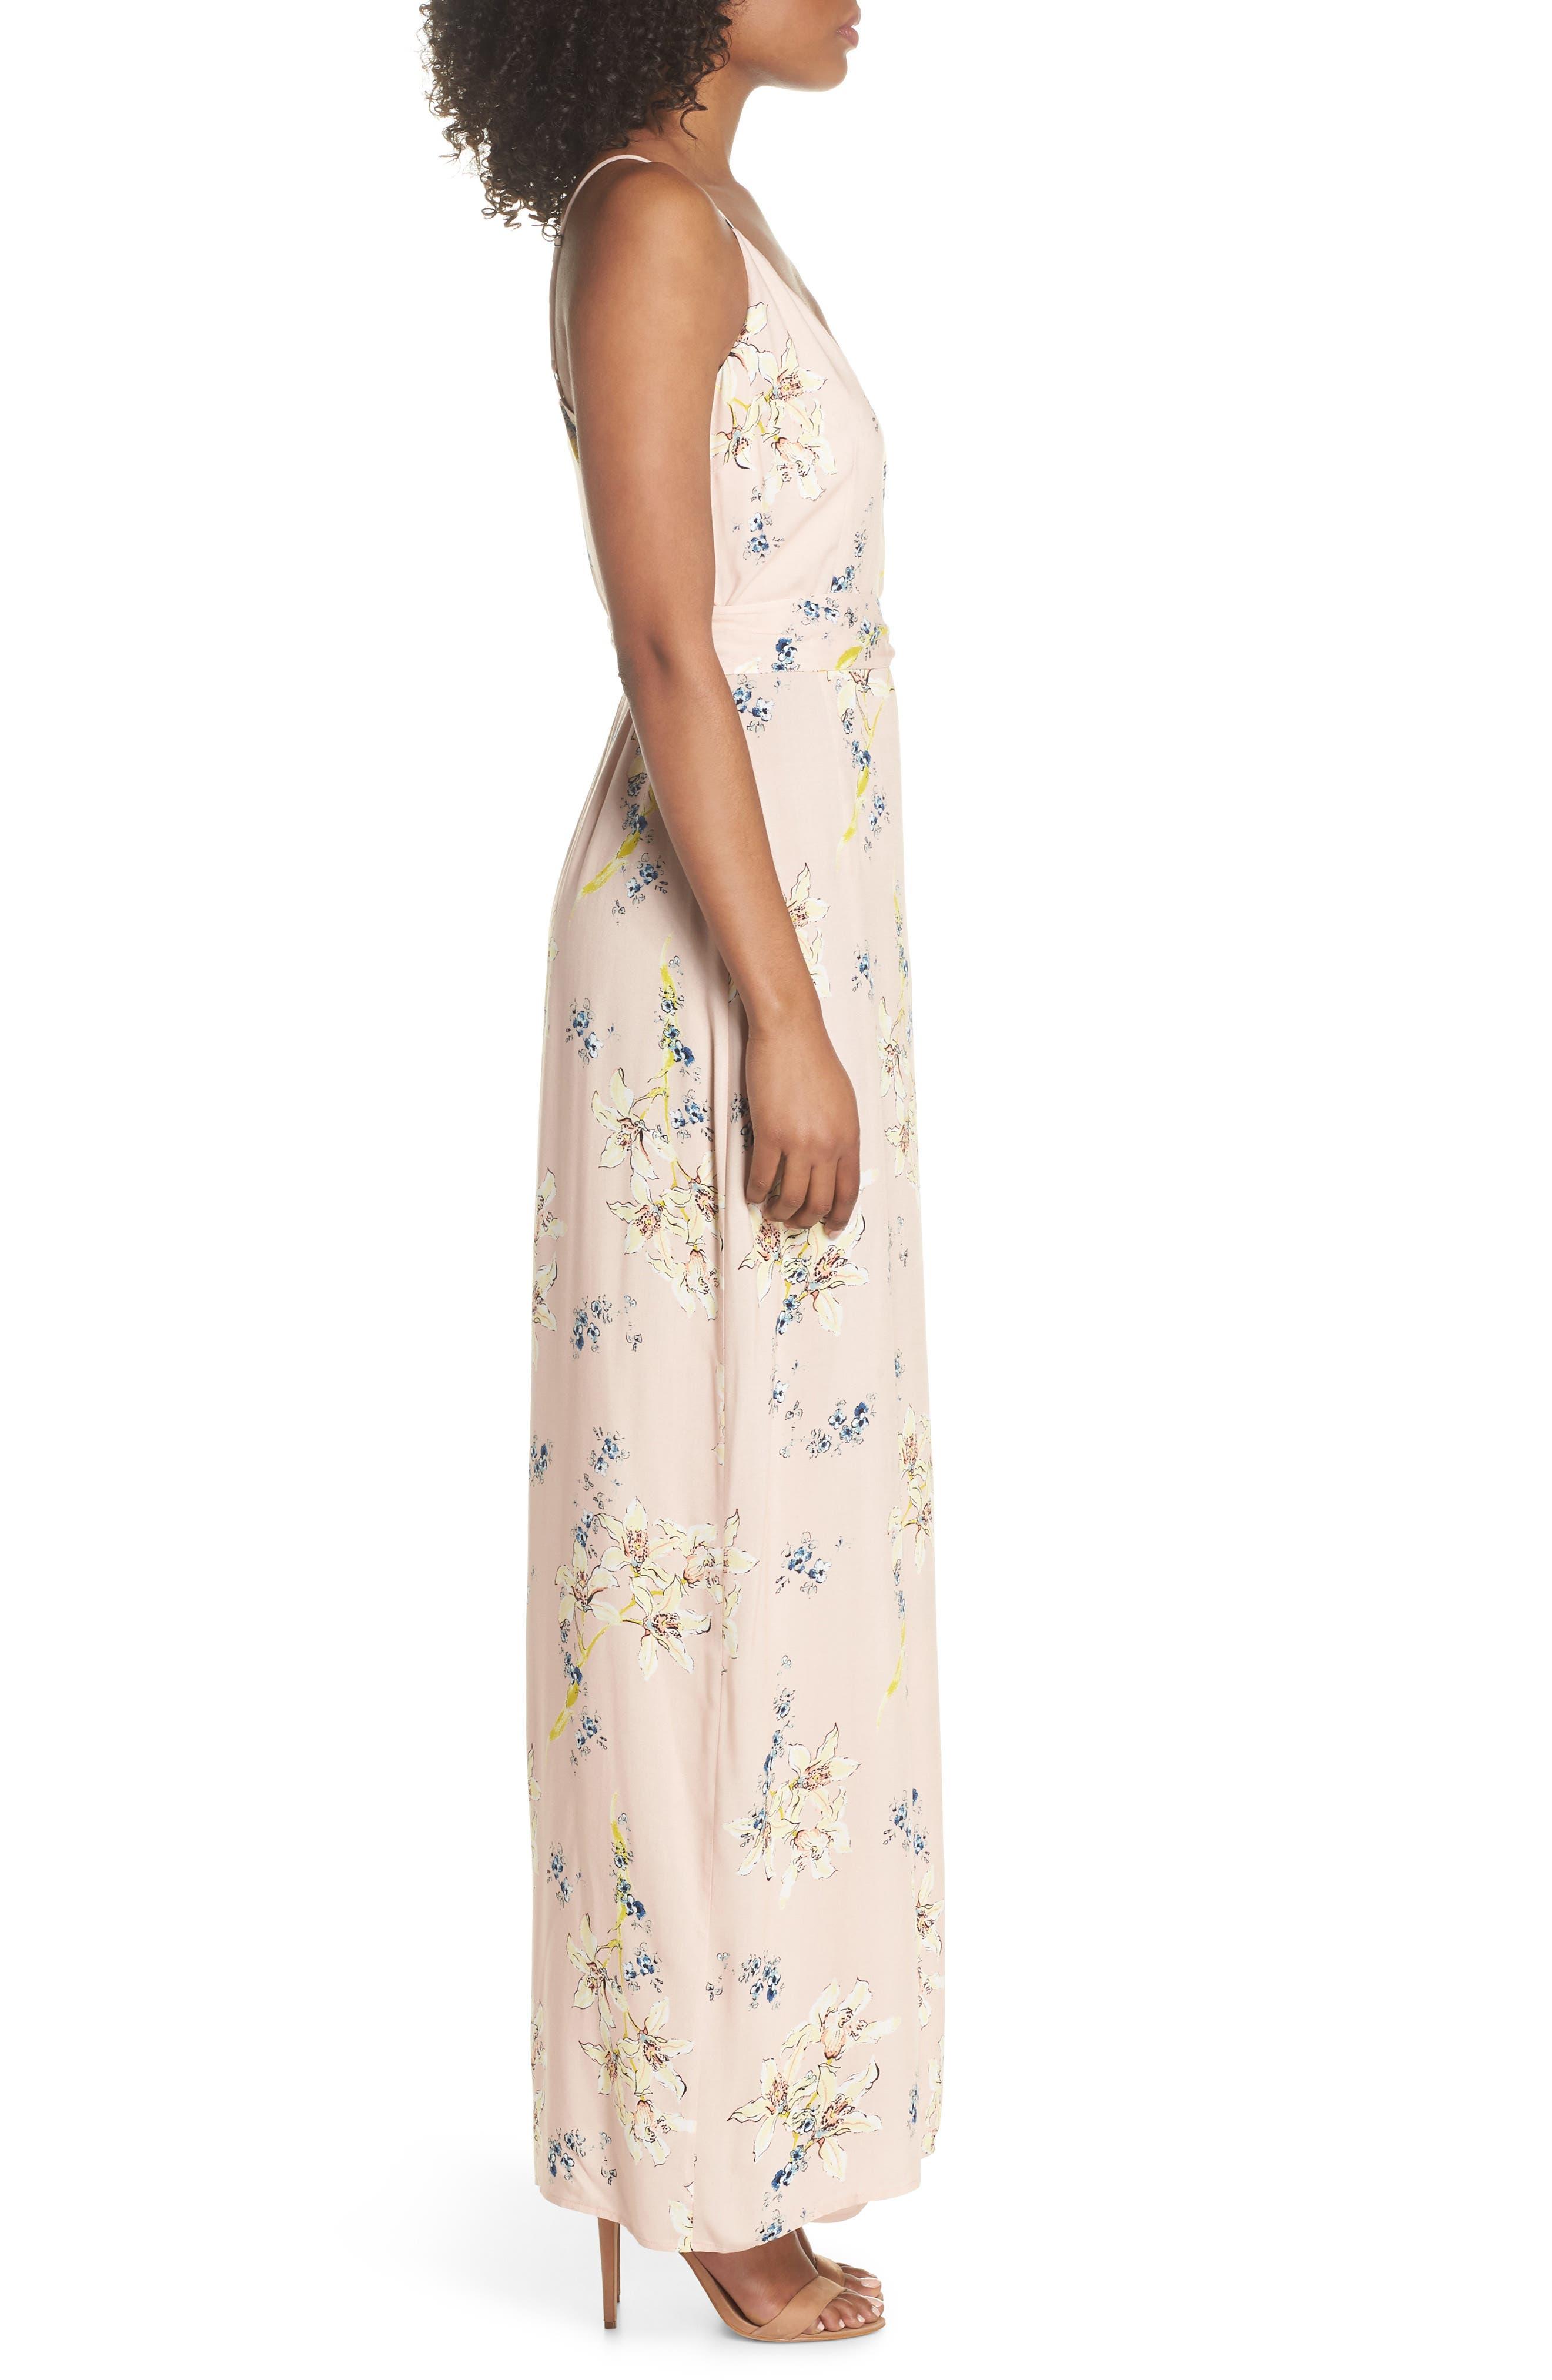 Regina Floral Print Maxi Dress,                             Alternate thumbnail 3, color,                             Tender Yellow Multi